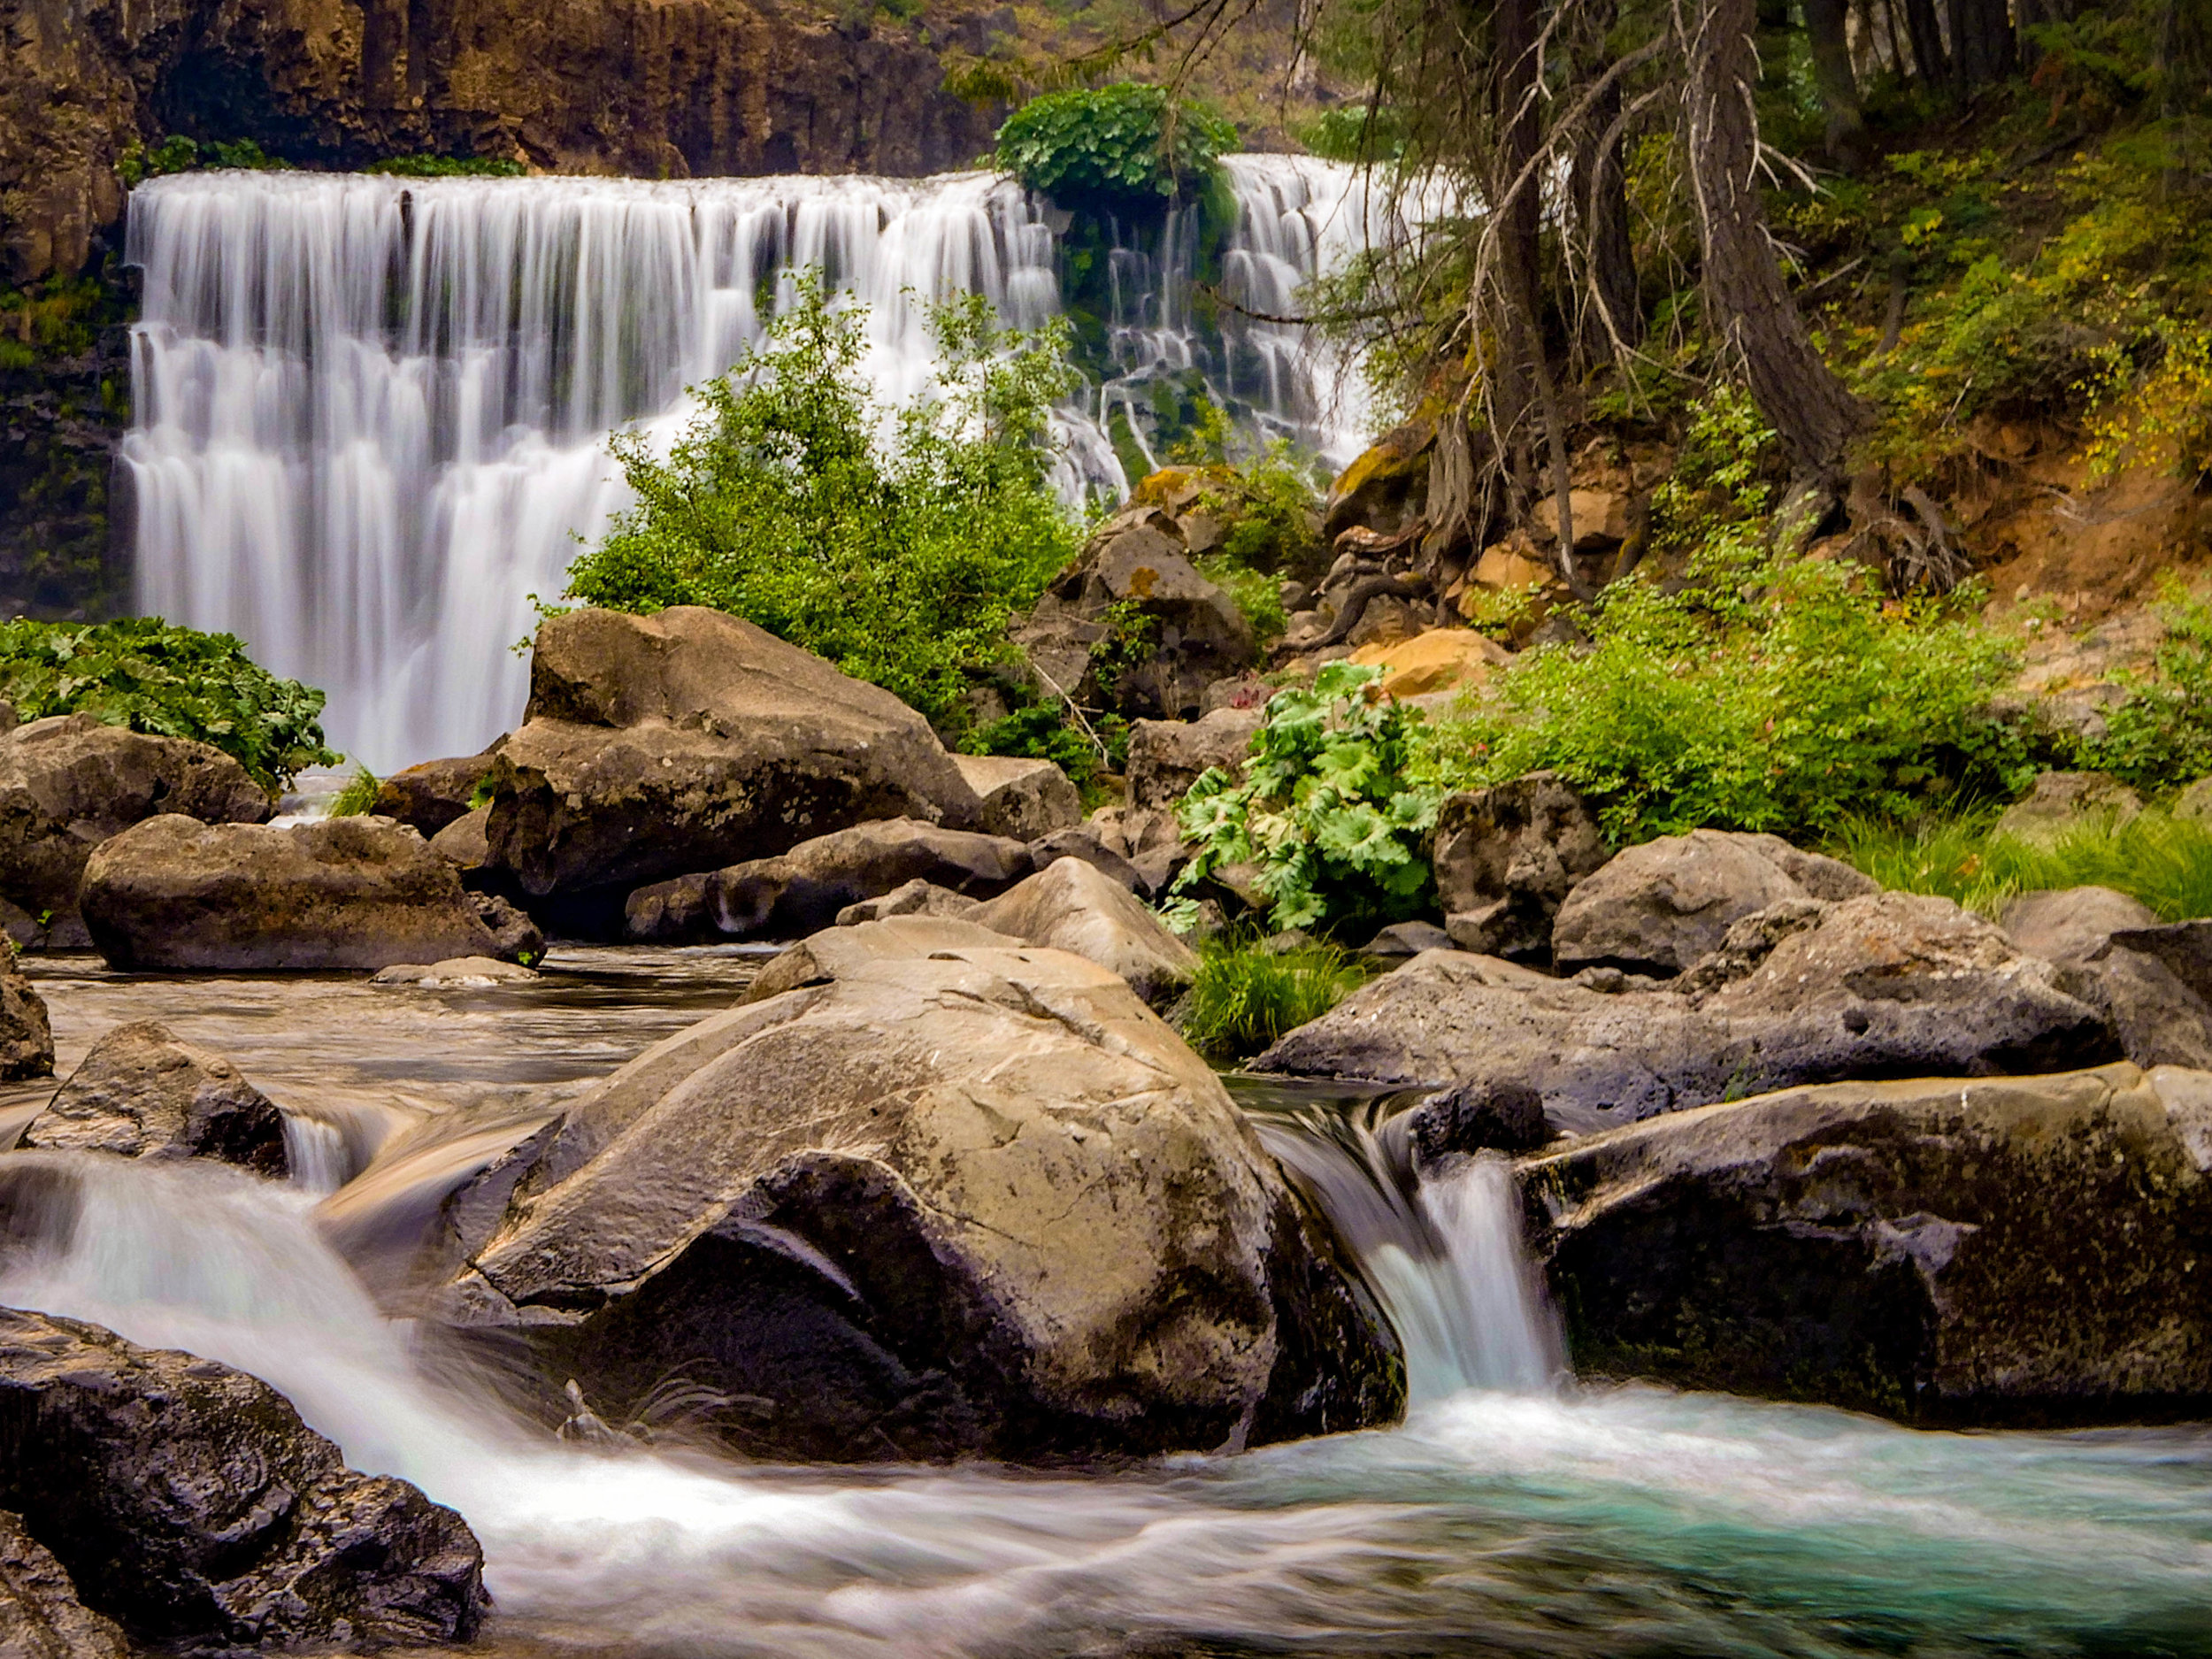 Middle Falls at McCloud Falls near Mt. Shasta